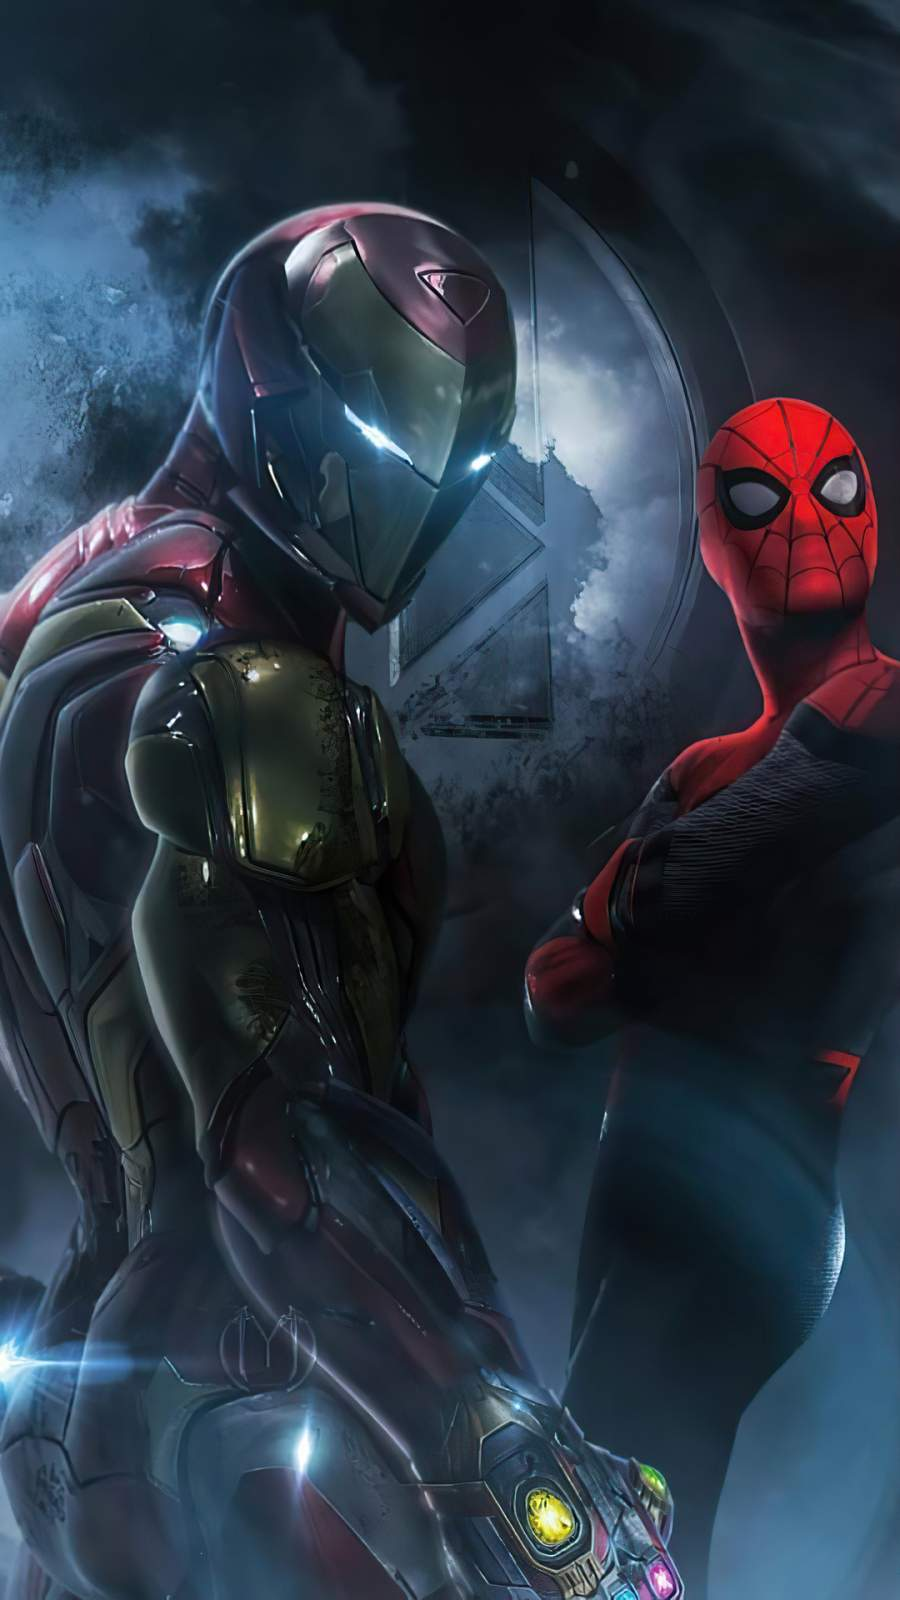 Future Iron Man and Spiderman